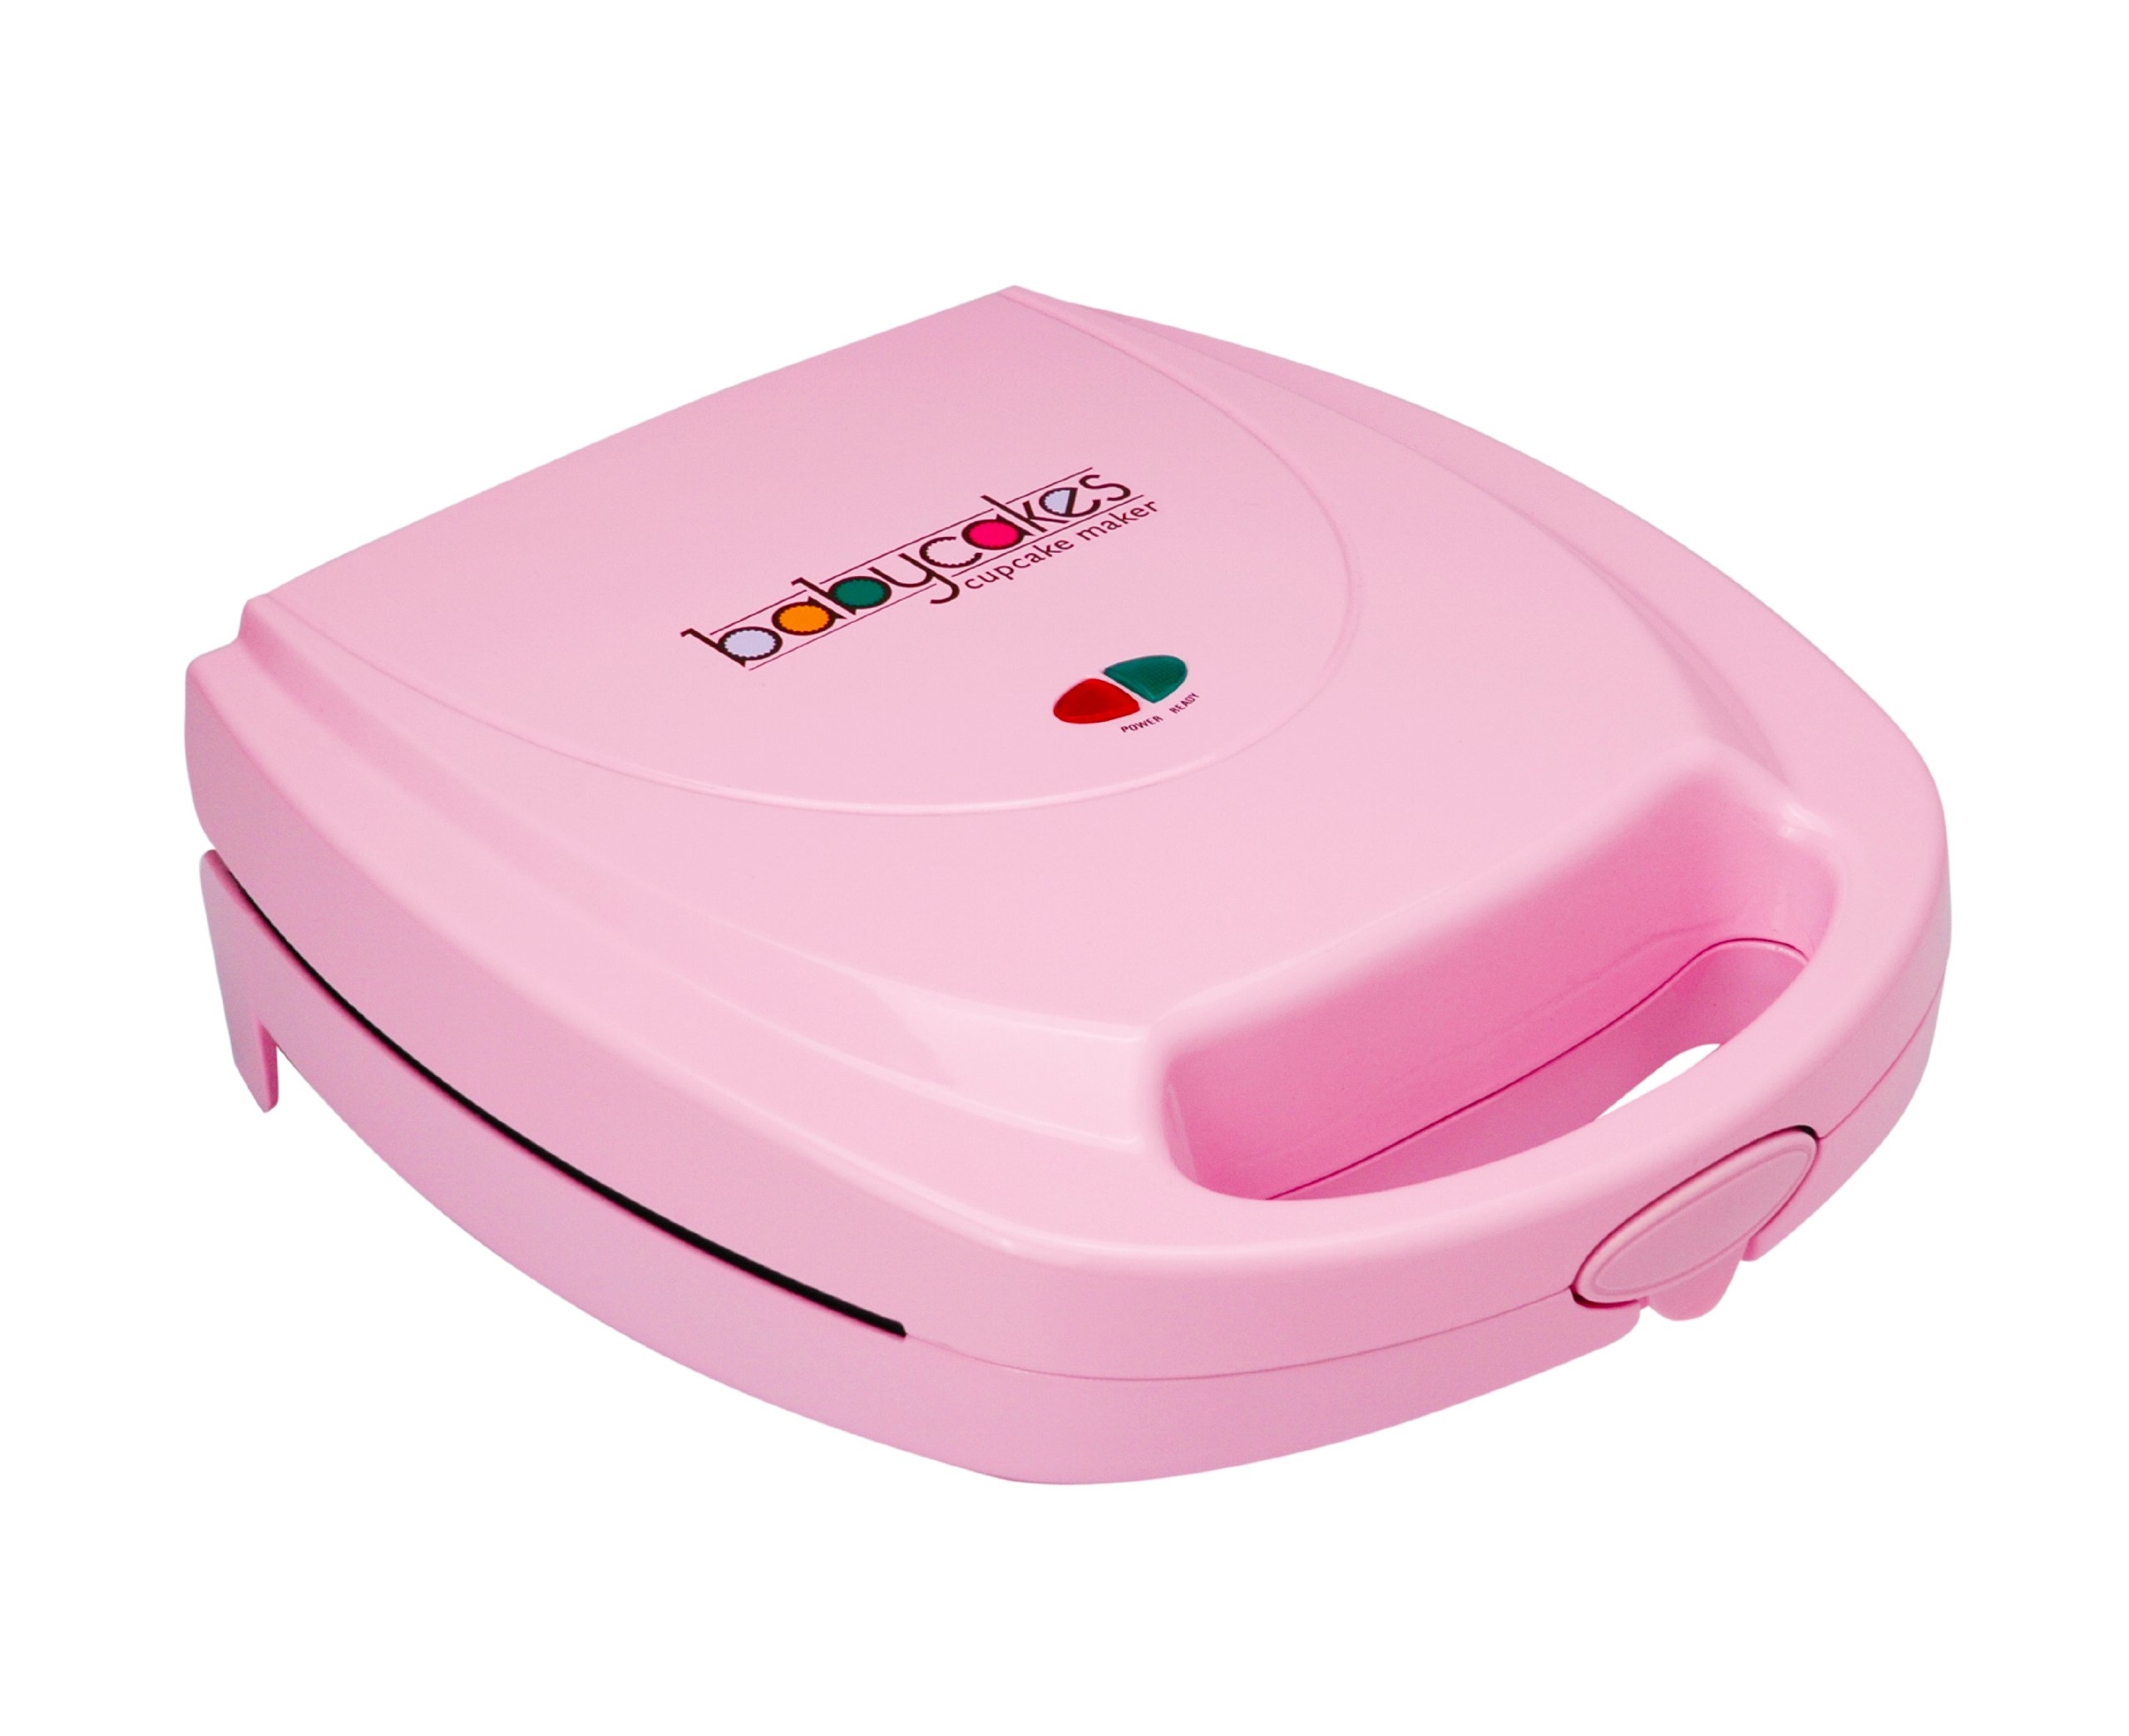 Babycakes CC-2828PK Cupcake Maker, Pink, 8 Cupcakes by Babycakes